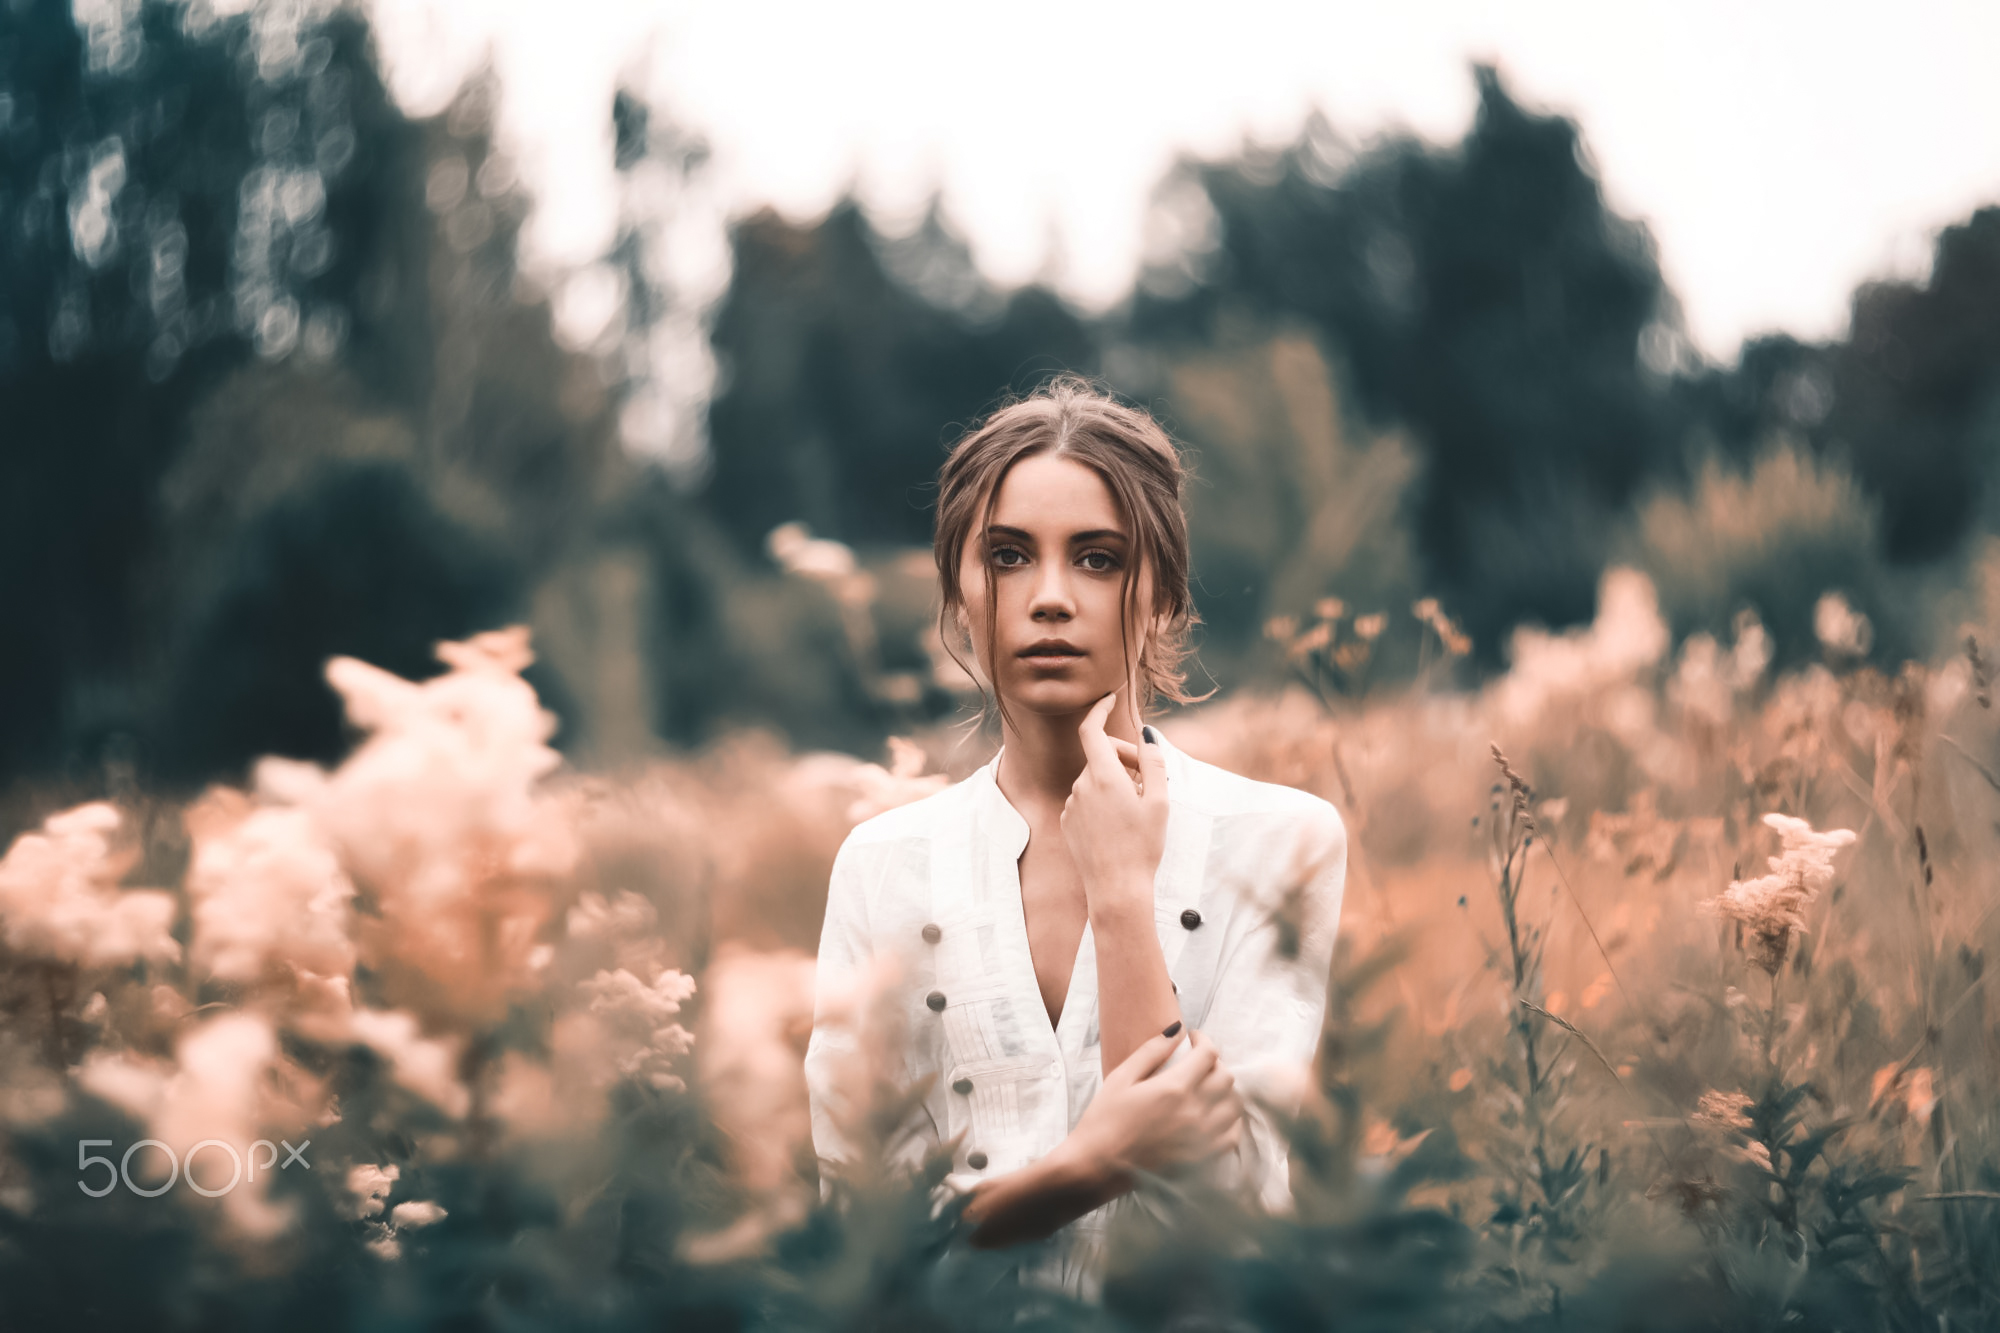 Yuri Egoroff Women Ksenia Kokoreva Brunette White Clothing Makeup Looking At Viewer Eyeshadow Nature 2000x1333